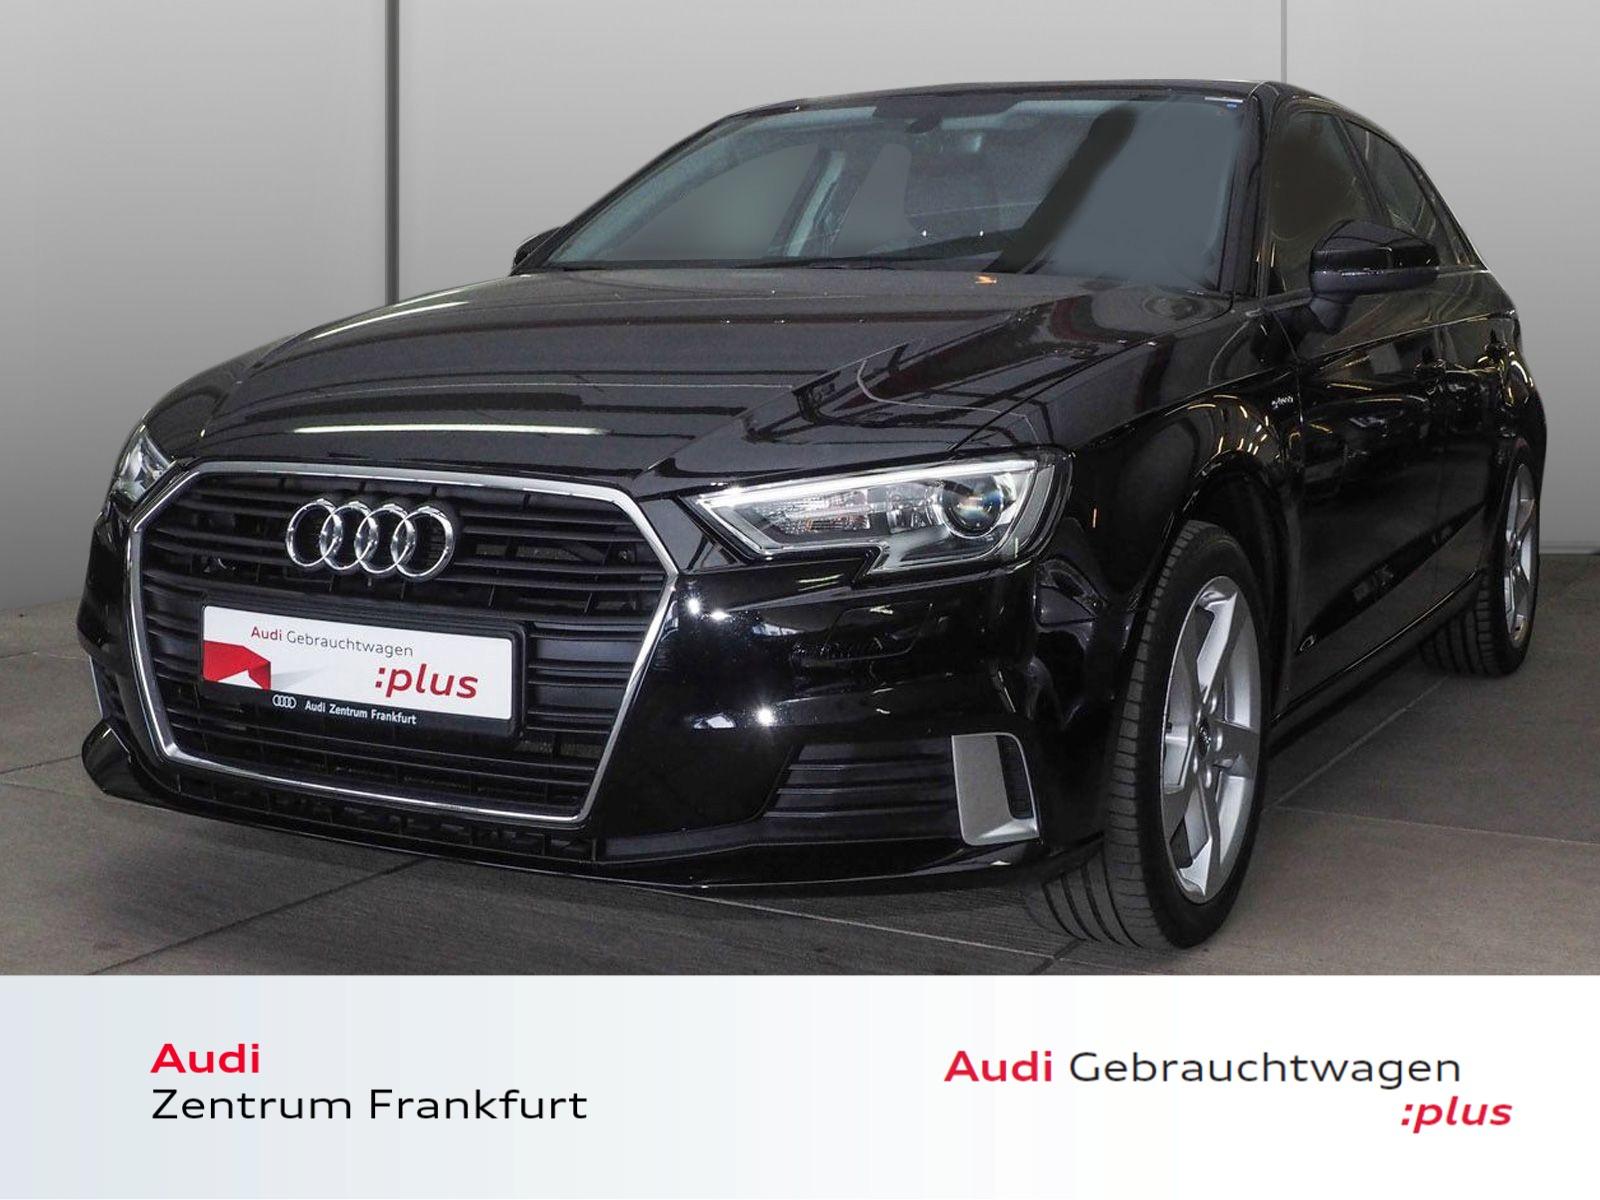 Audi A3 Sportback 1.4 TFSI sport S tronic Xenon Bluetooth Sitzheizung, Jahr 2018, other